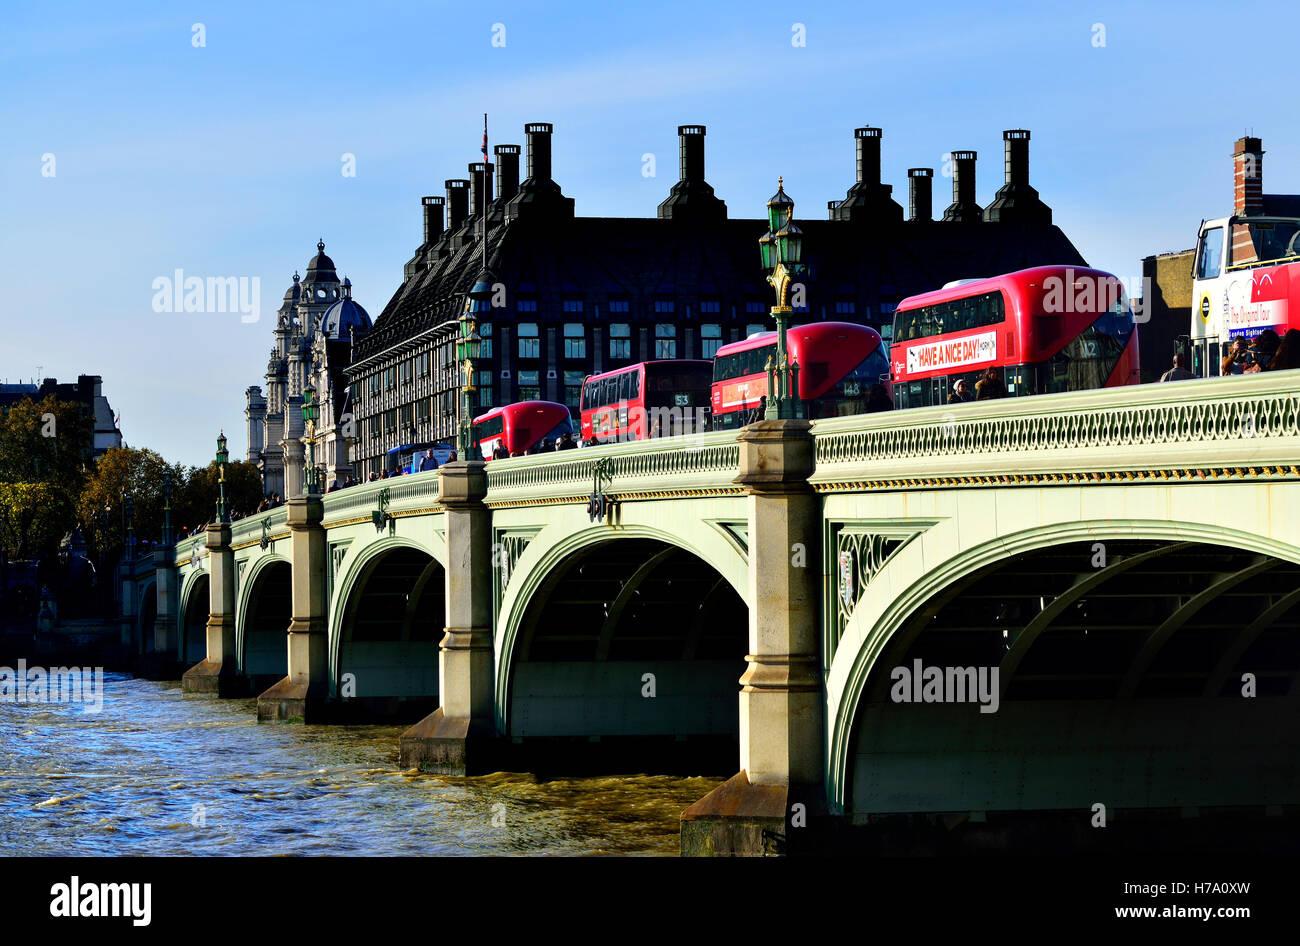 London, England, UK. Double Decker buses crossing Westminster Bridge towards Portcullis House - Stock Image